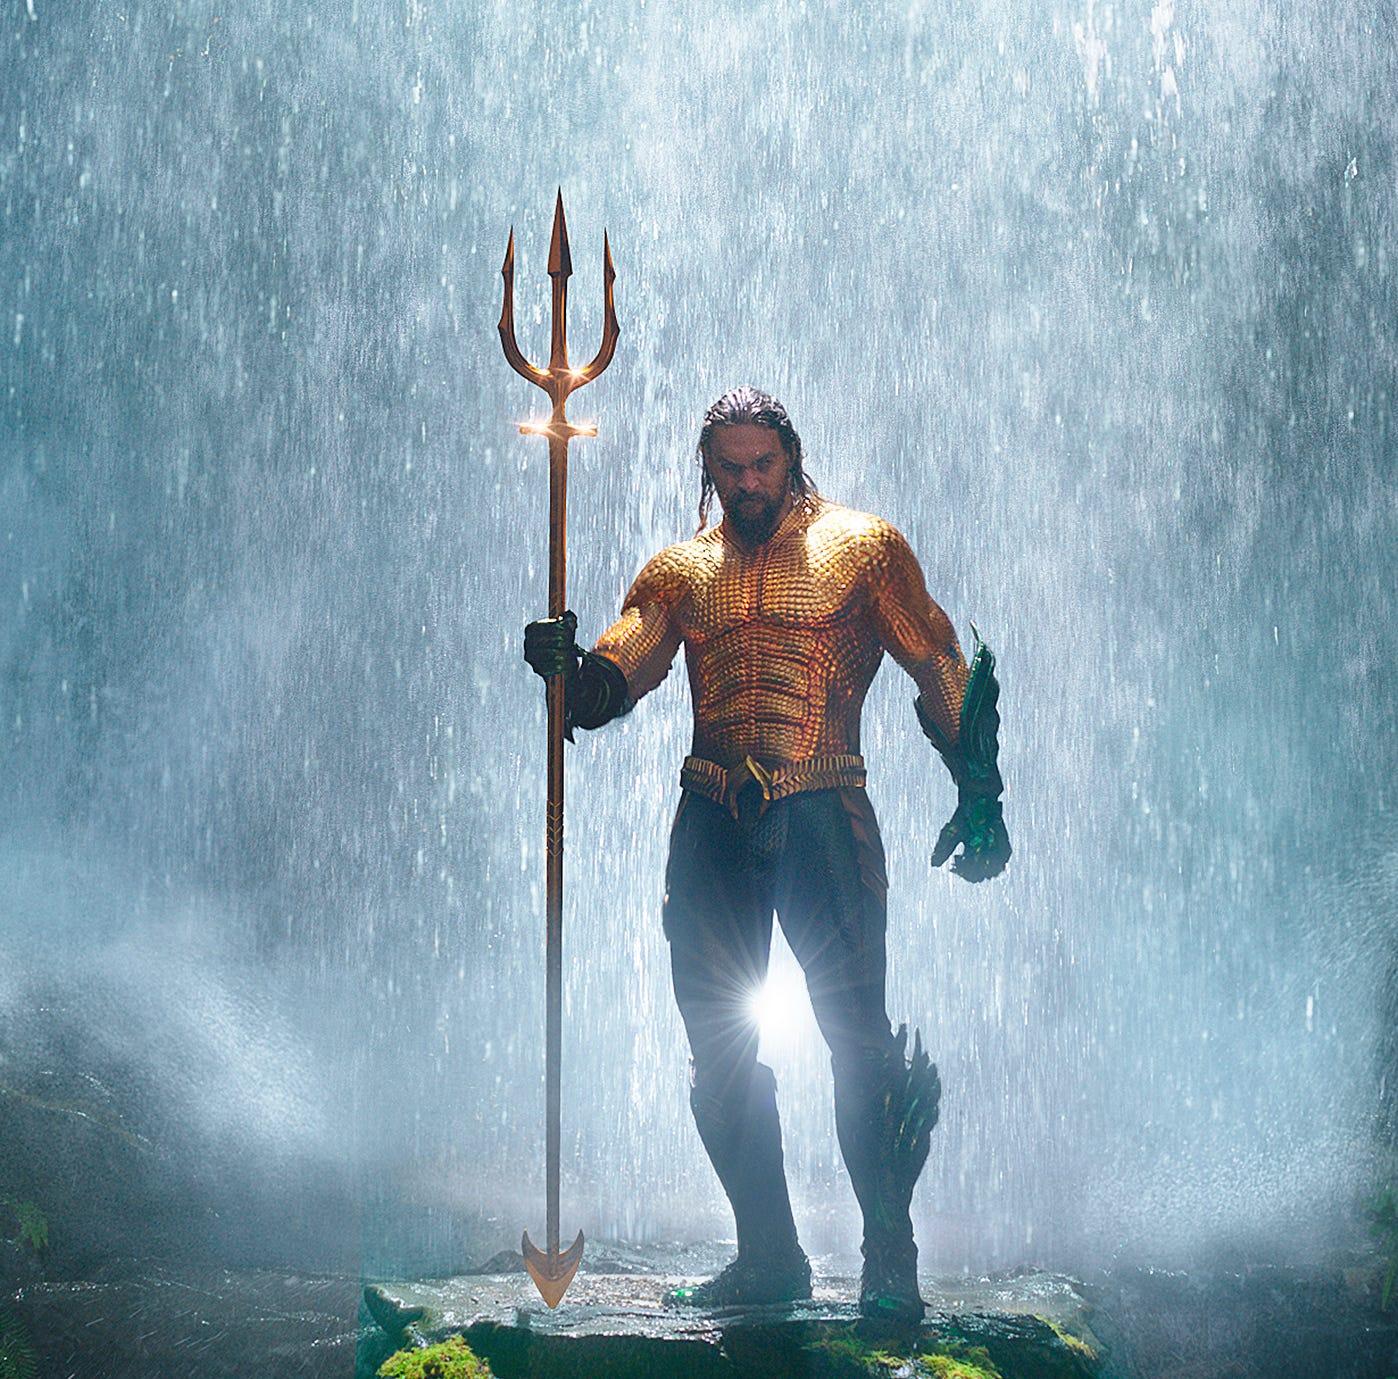 Film review: Charismatic Jason Momoa swims, but 'Aquaman' sinks